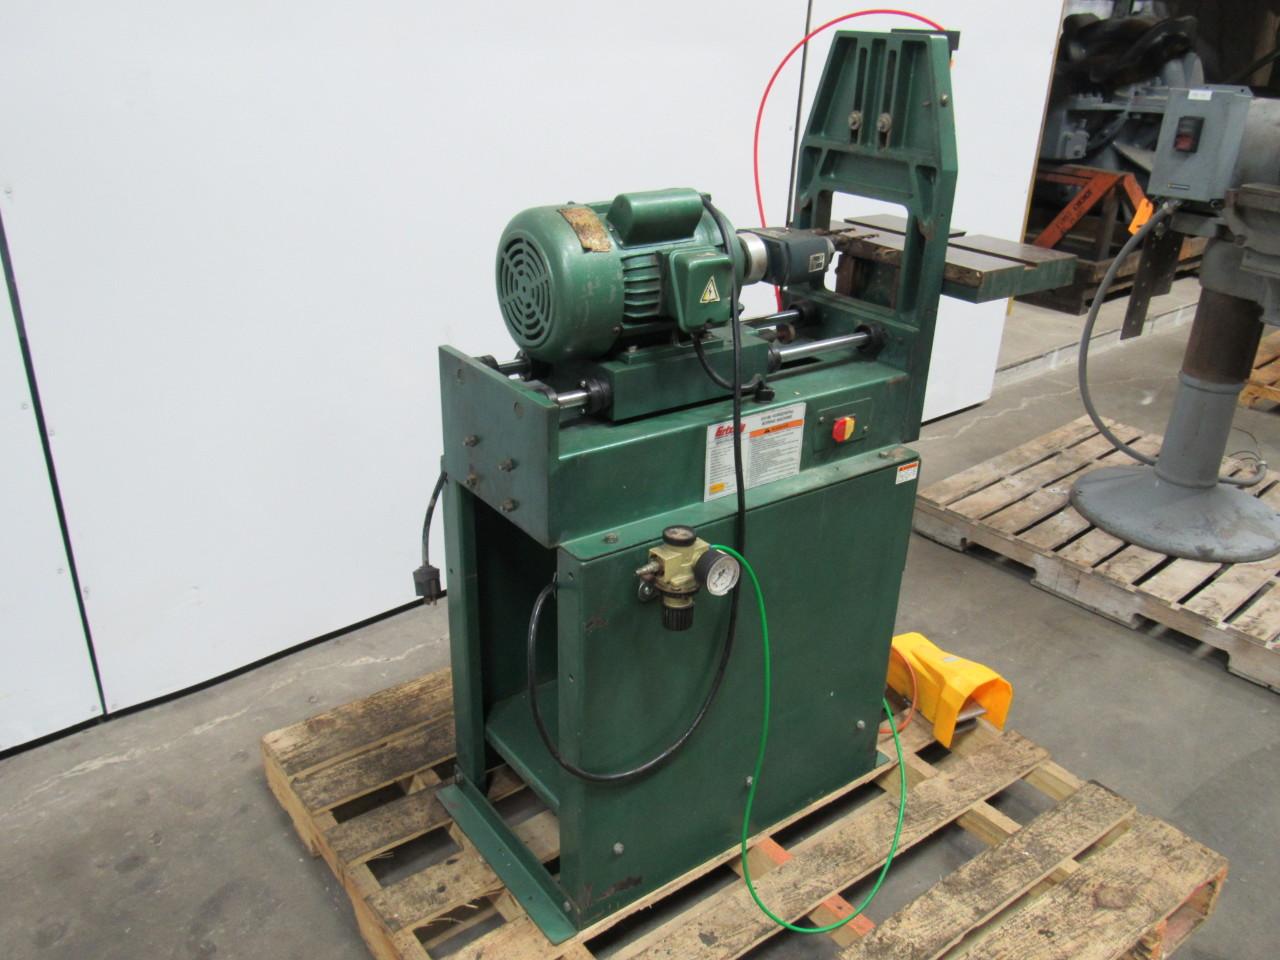 Spindle Boring Machine : Grizzly g c w horizontal boring machine